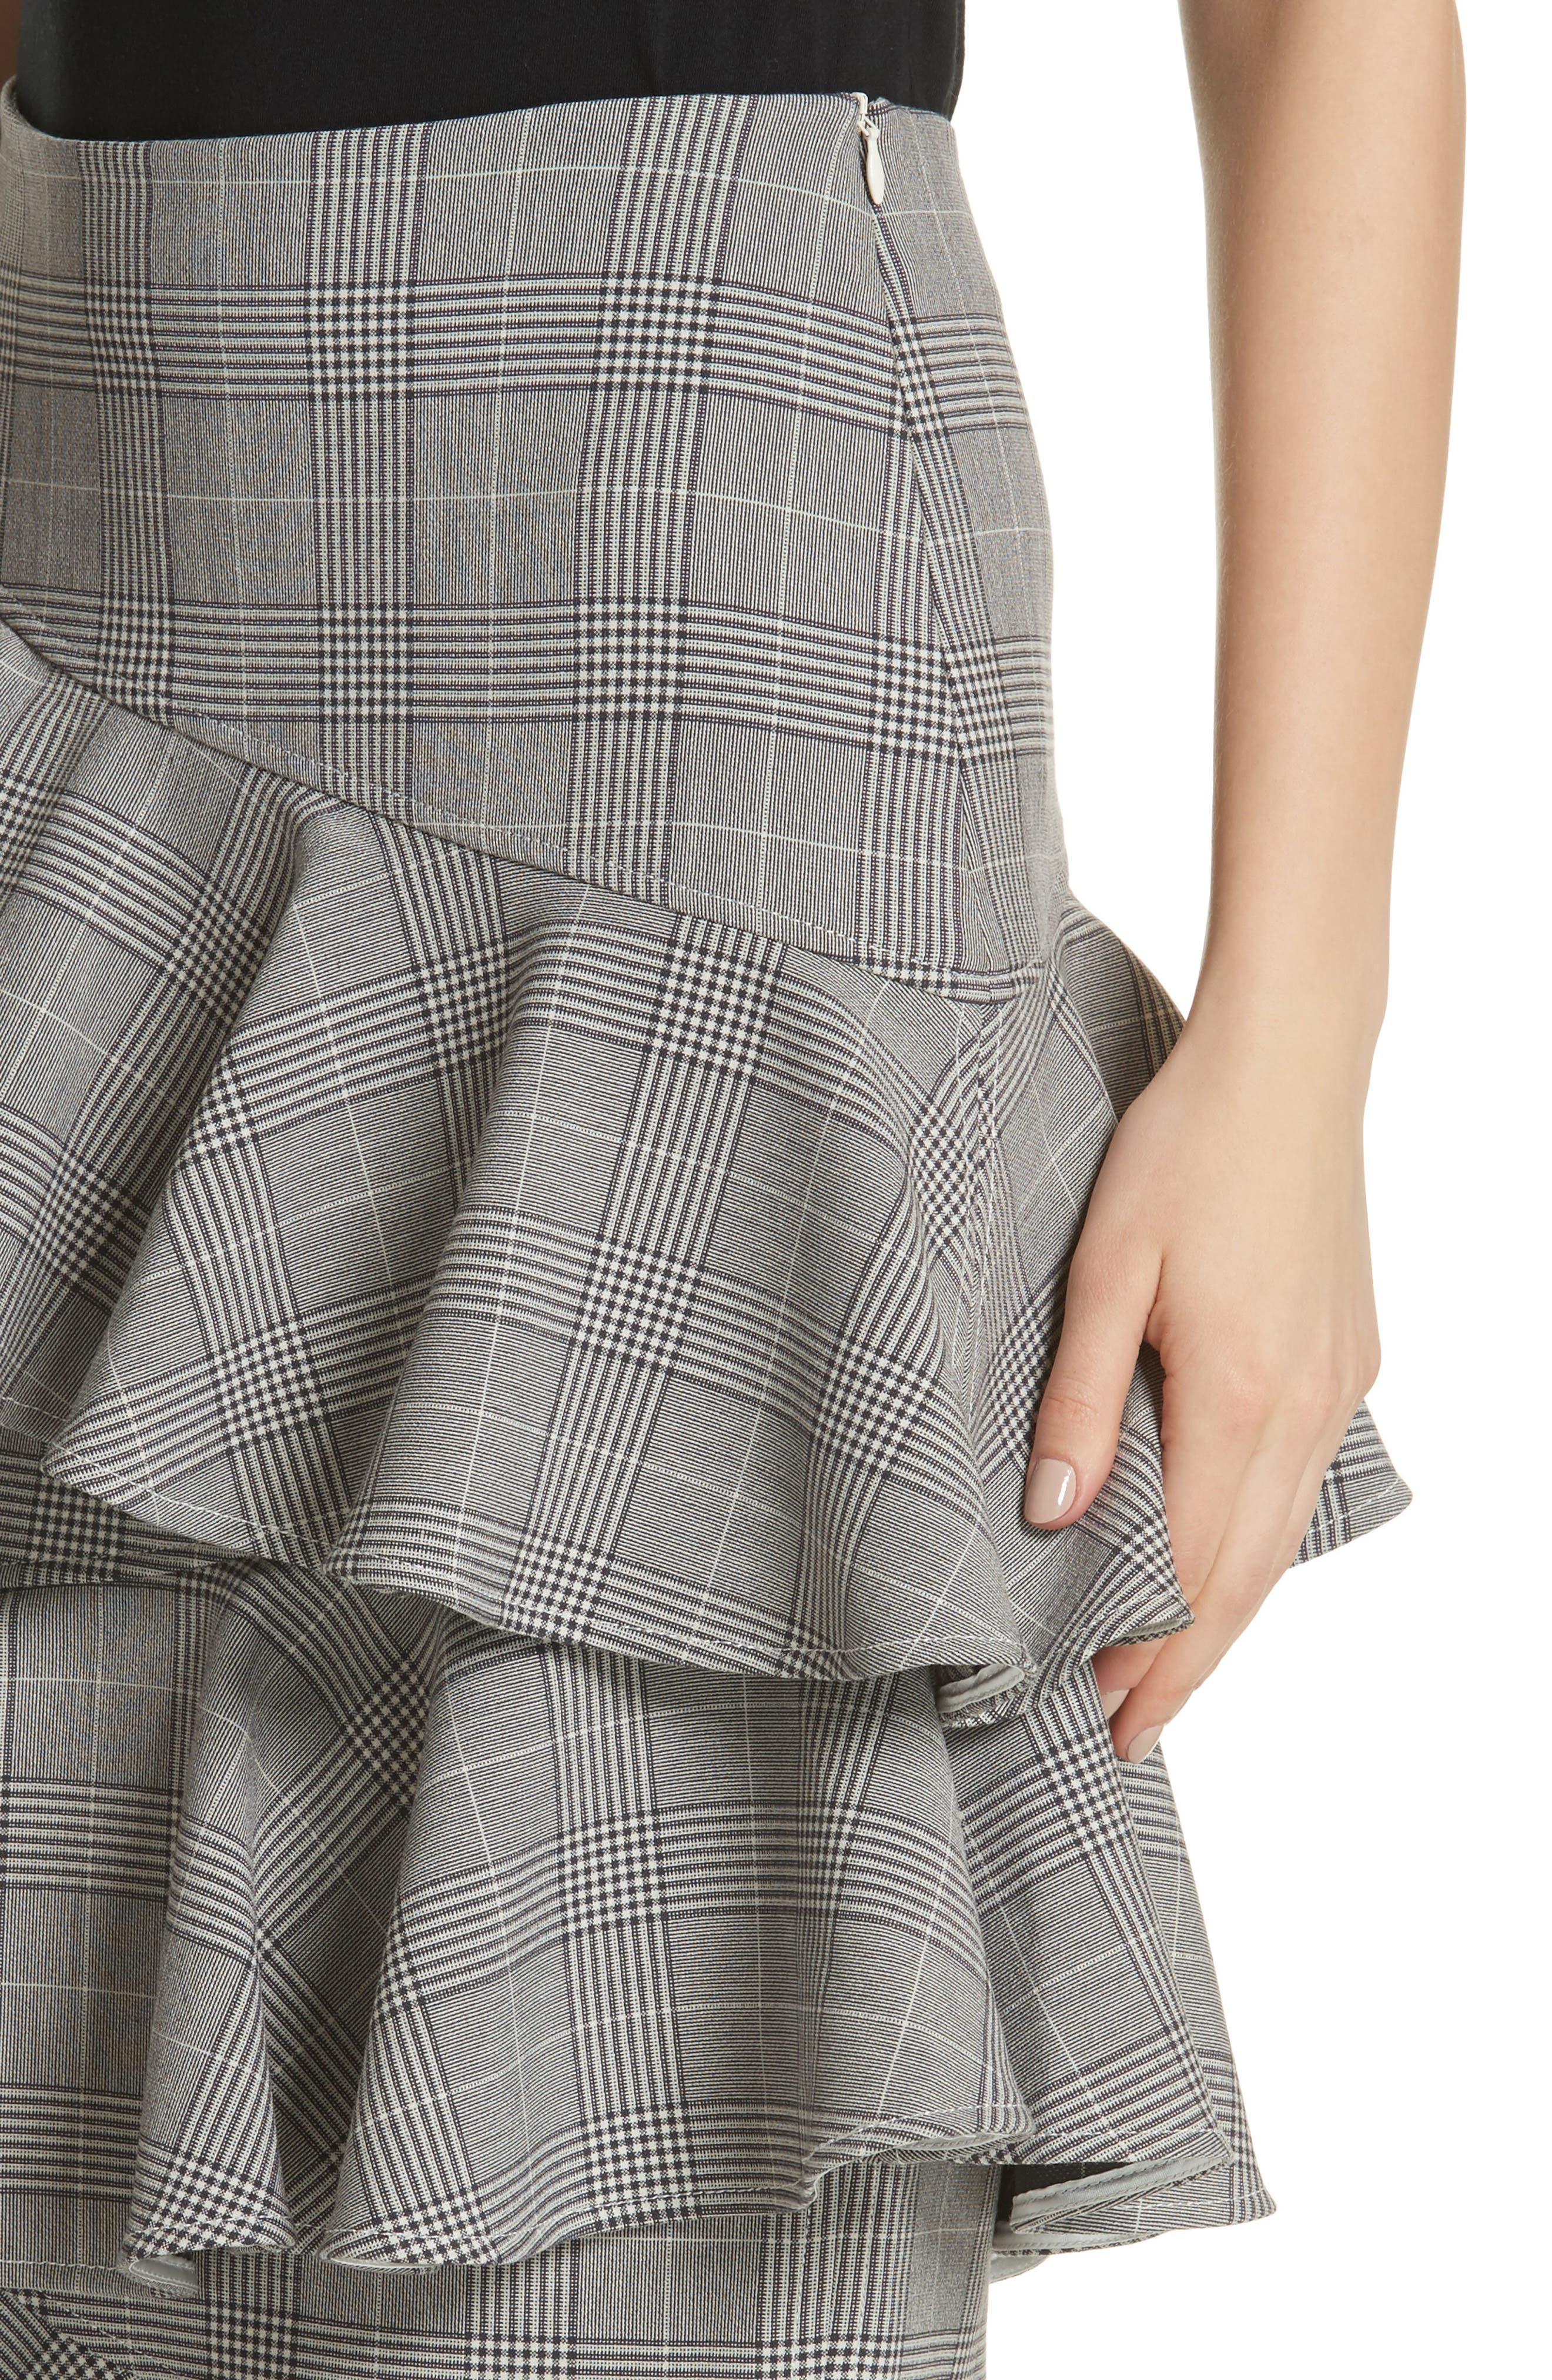 Garvey Plaid Ruffle Tier Skirt,                             Alternate thumbnail 4, color,                             020